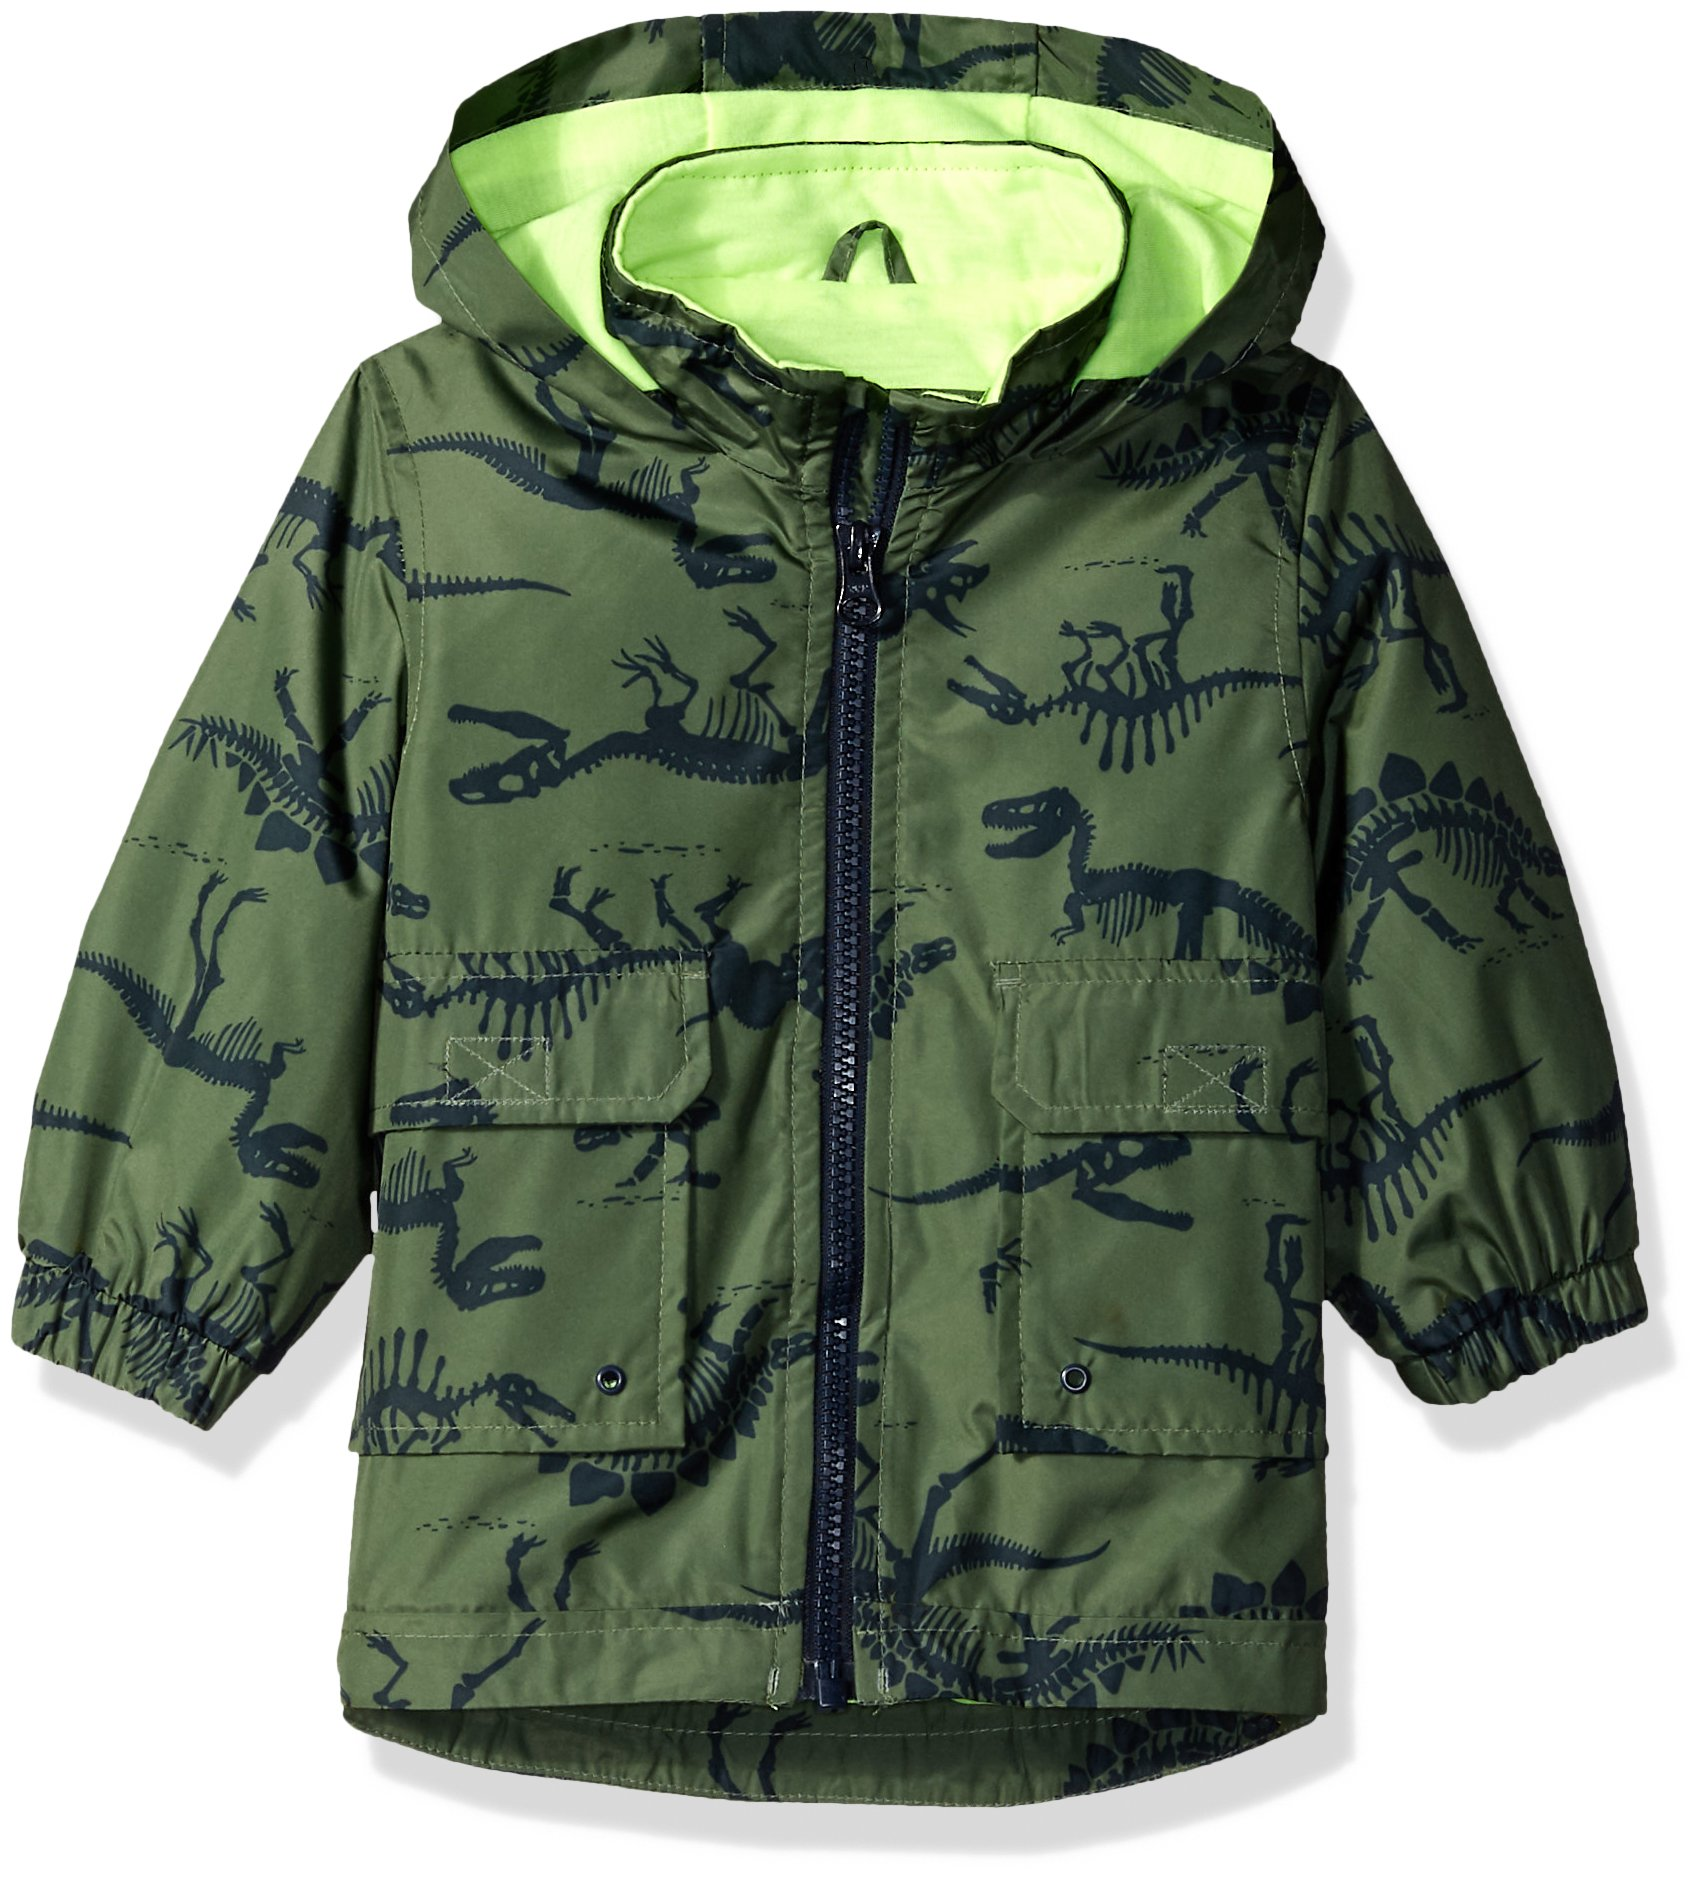 Carter's Baby Boys His Favorite Rainslicker Rain Jacket, Green Dinosaur Print, 24M